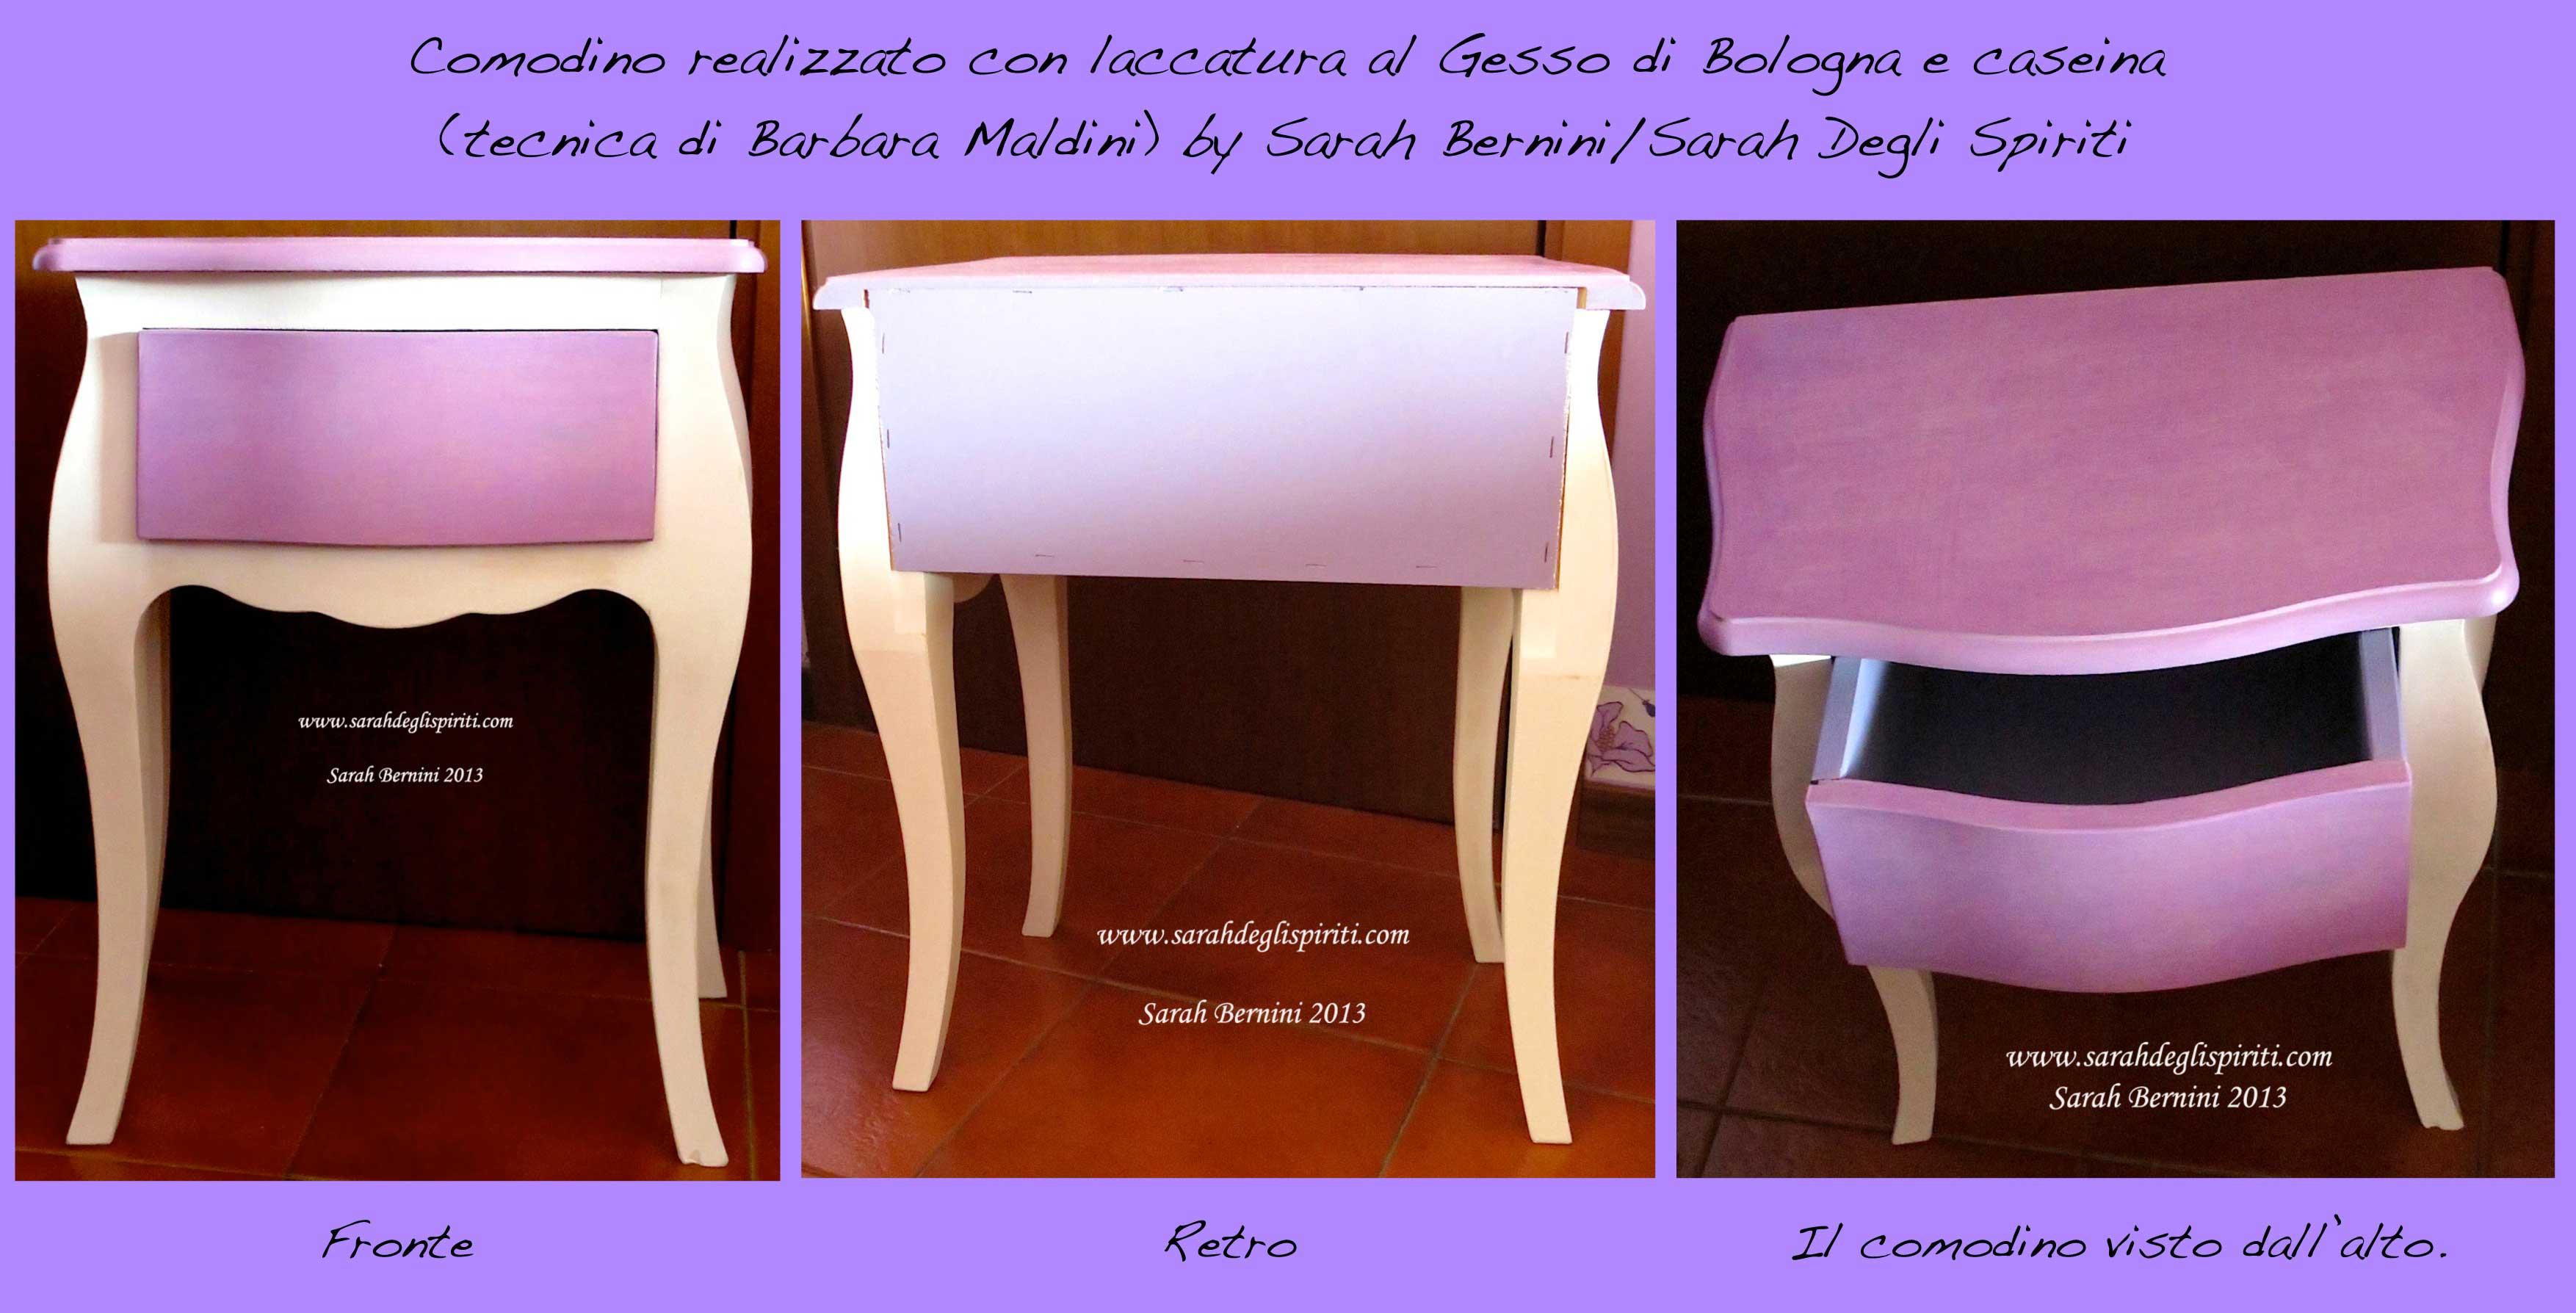 Comodino al gesso di Bologna e caseina by Sarah Bernini/Sarah Degli Spiriti